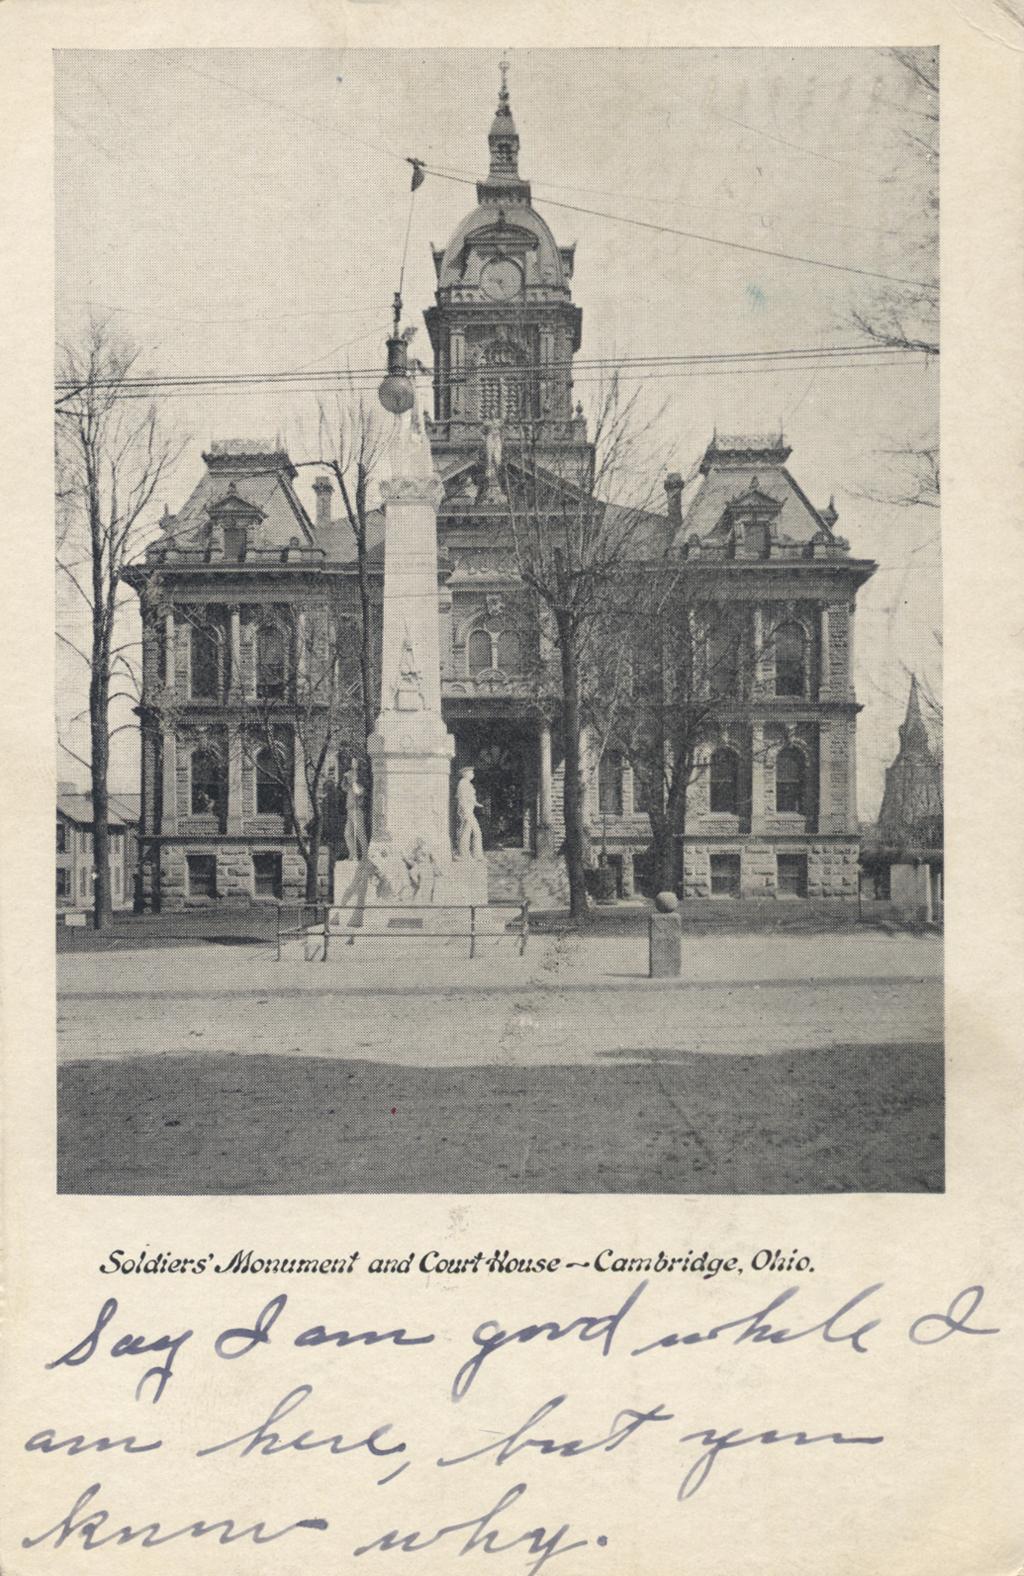 Guernsey County Courthouse (1881), Cambridge, 1906.